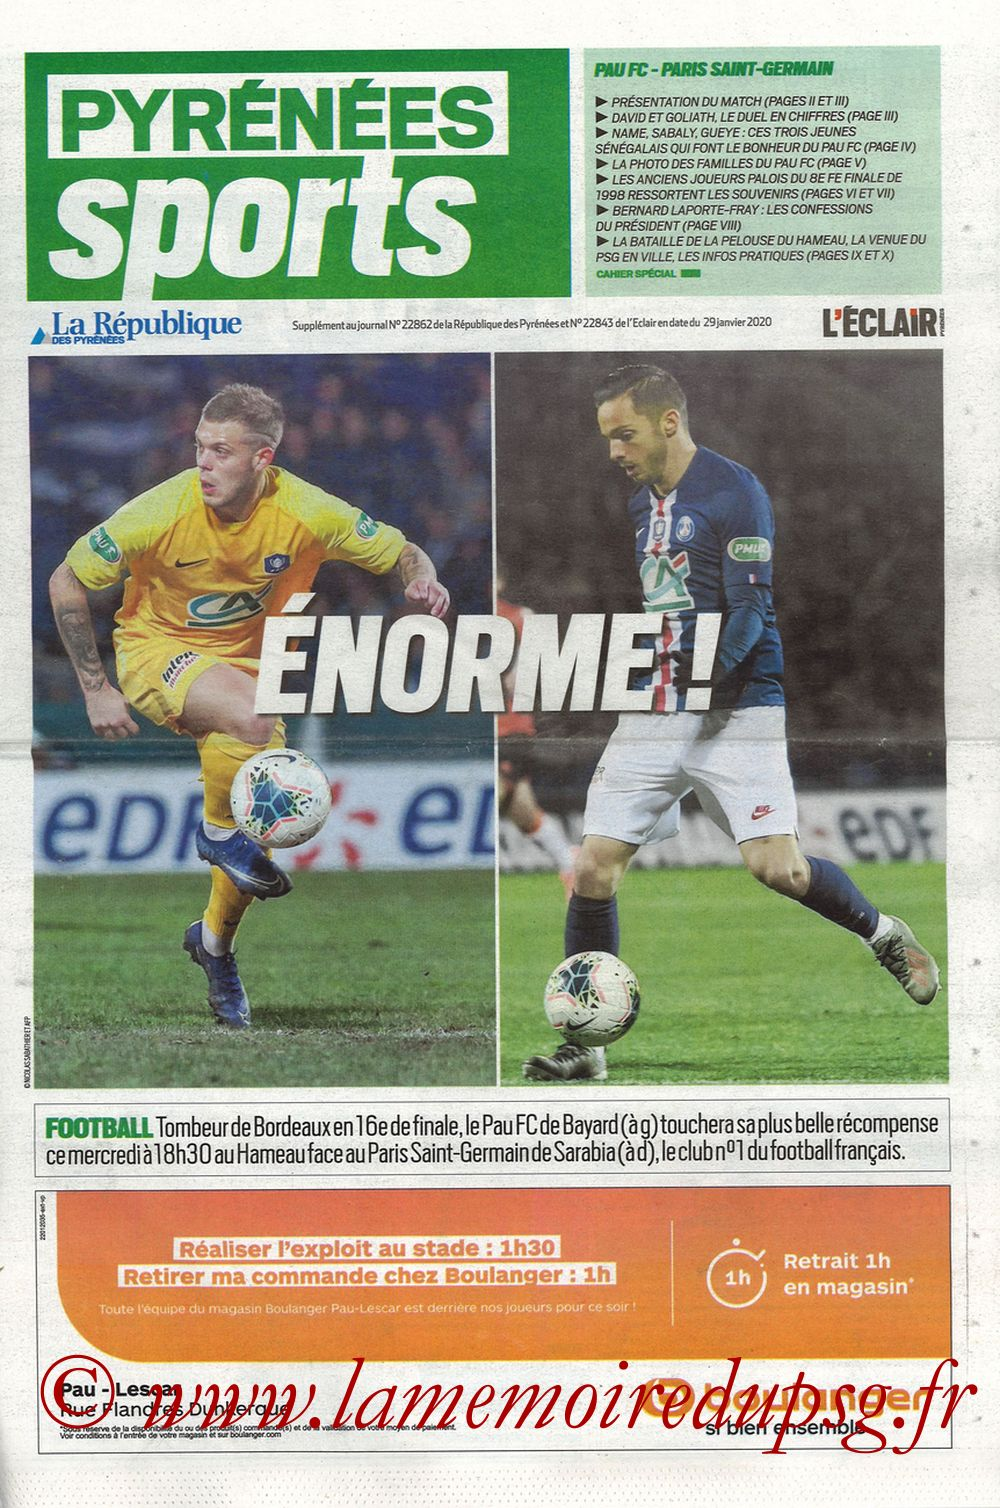 2020-01-29  Pau-PSG (8ème CF, Pyrenees Sports)